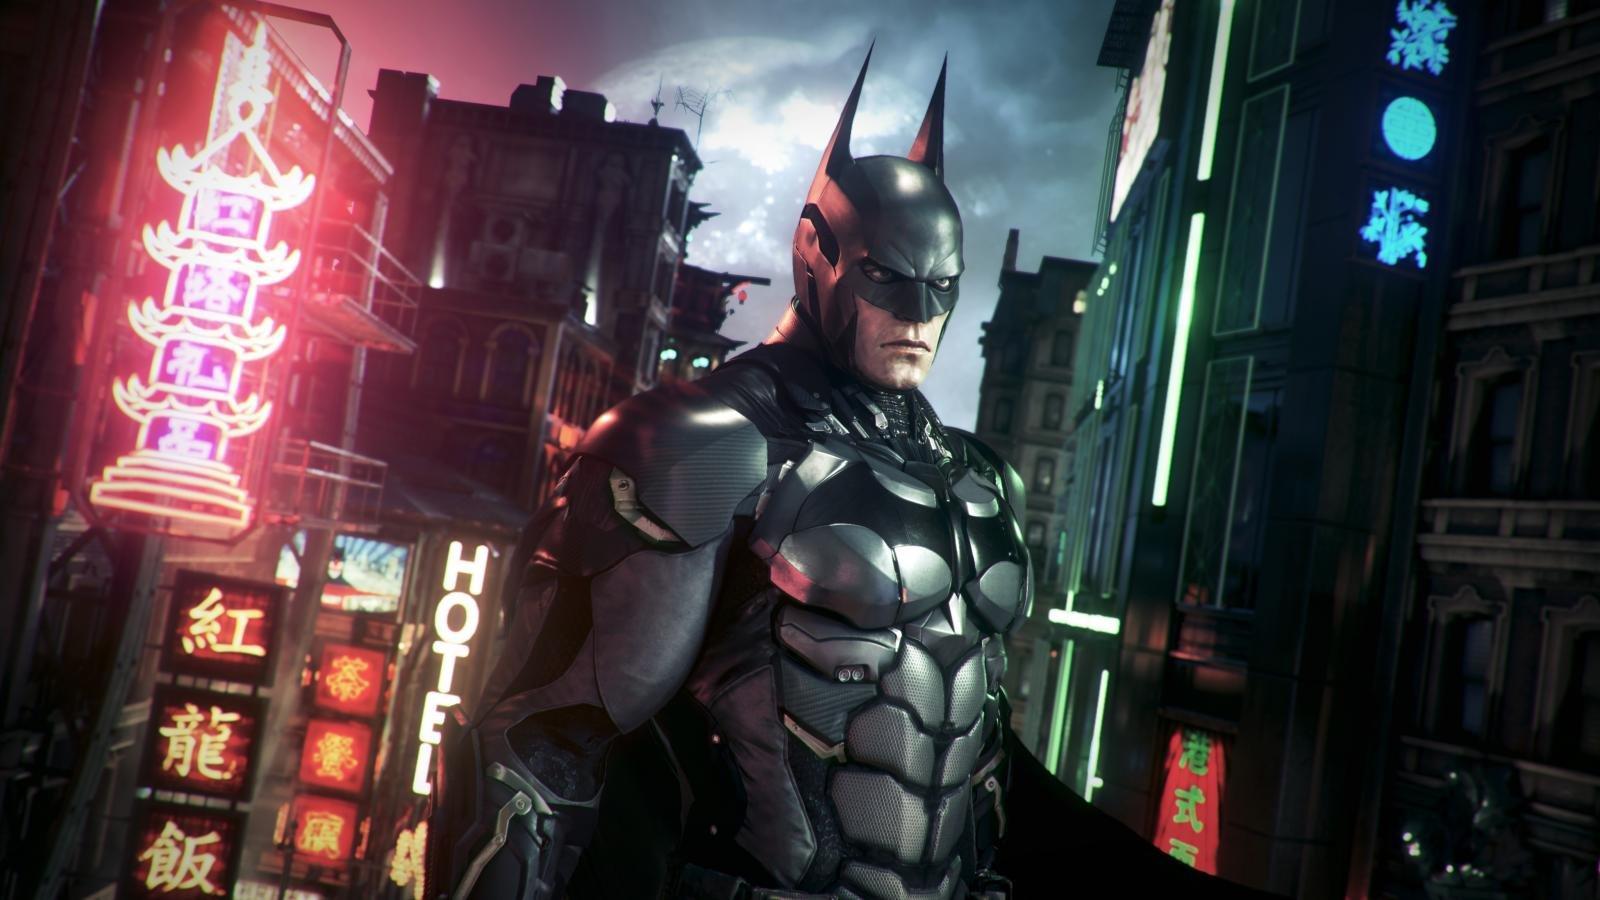 Batman Arkham Knight Wallpapers 1600x900 Desktop Backgrounds